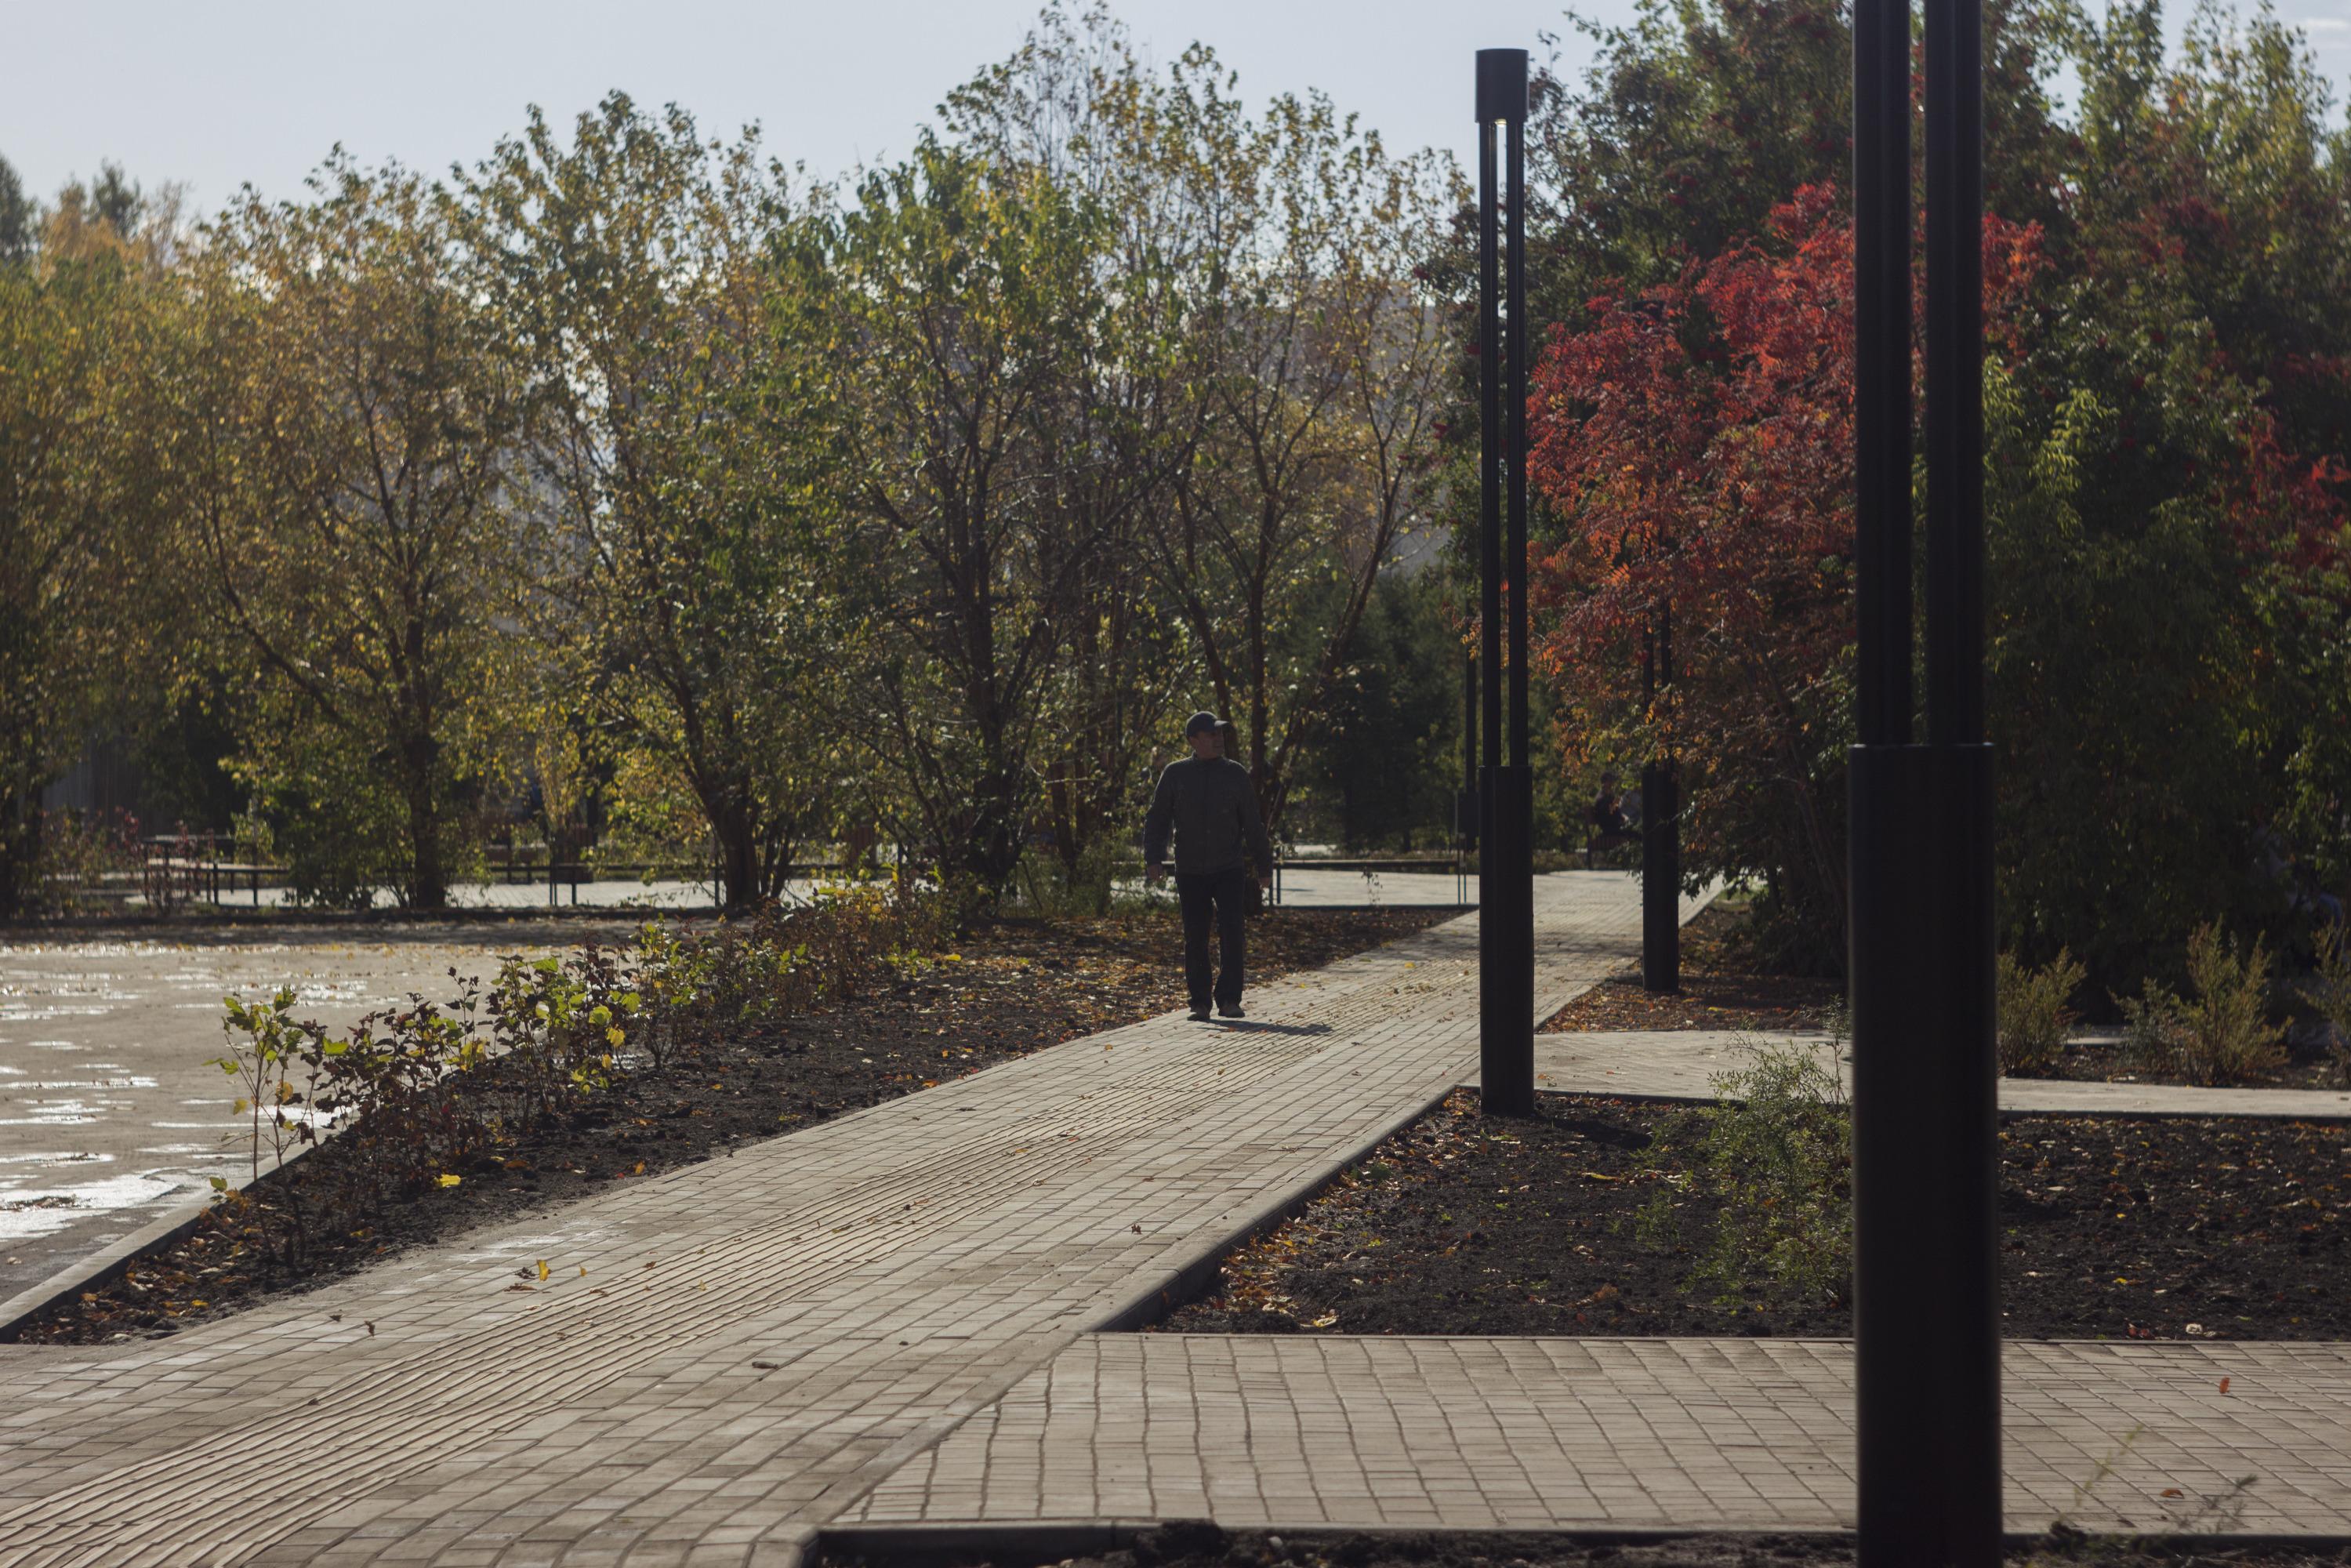 На территории Затулинского парка полностью поменяли плитку